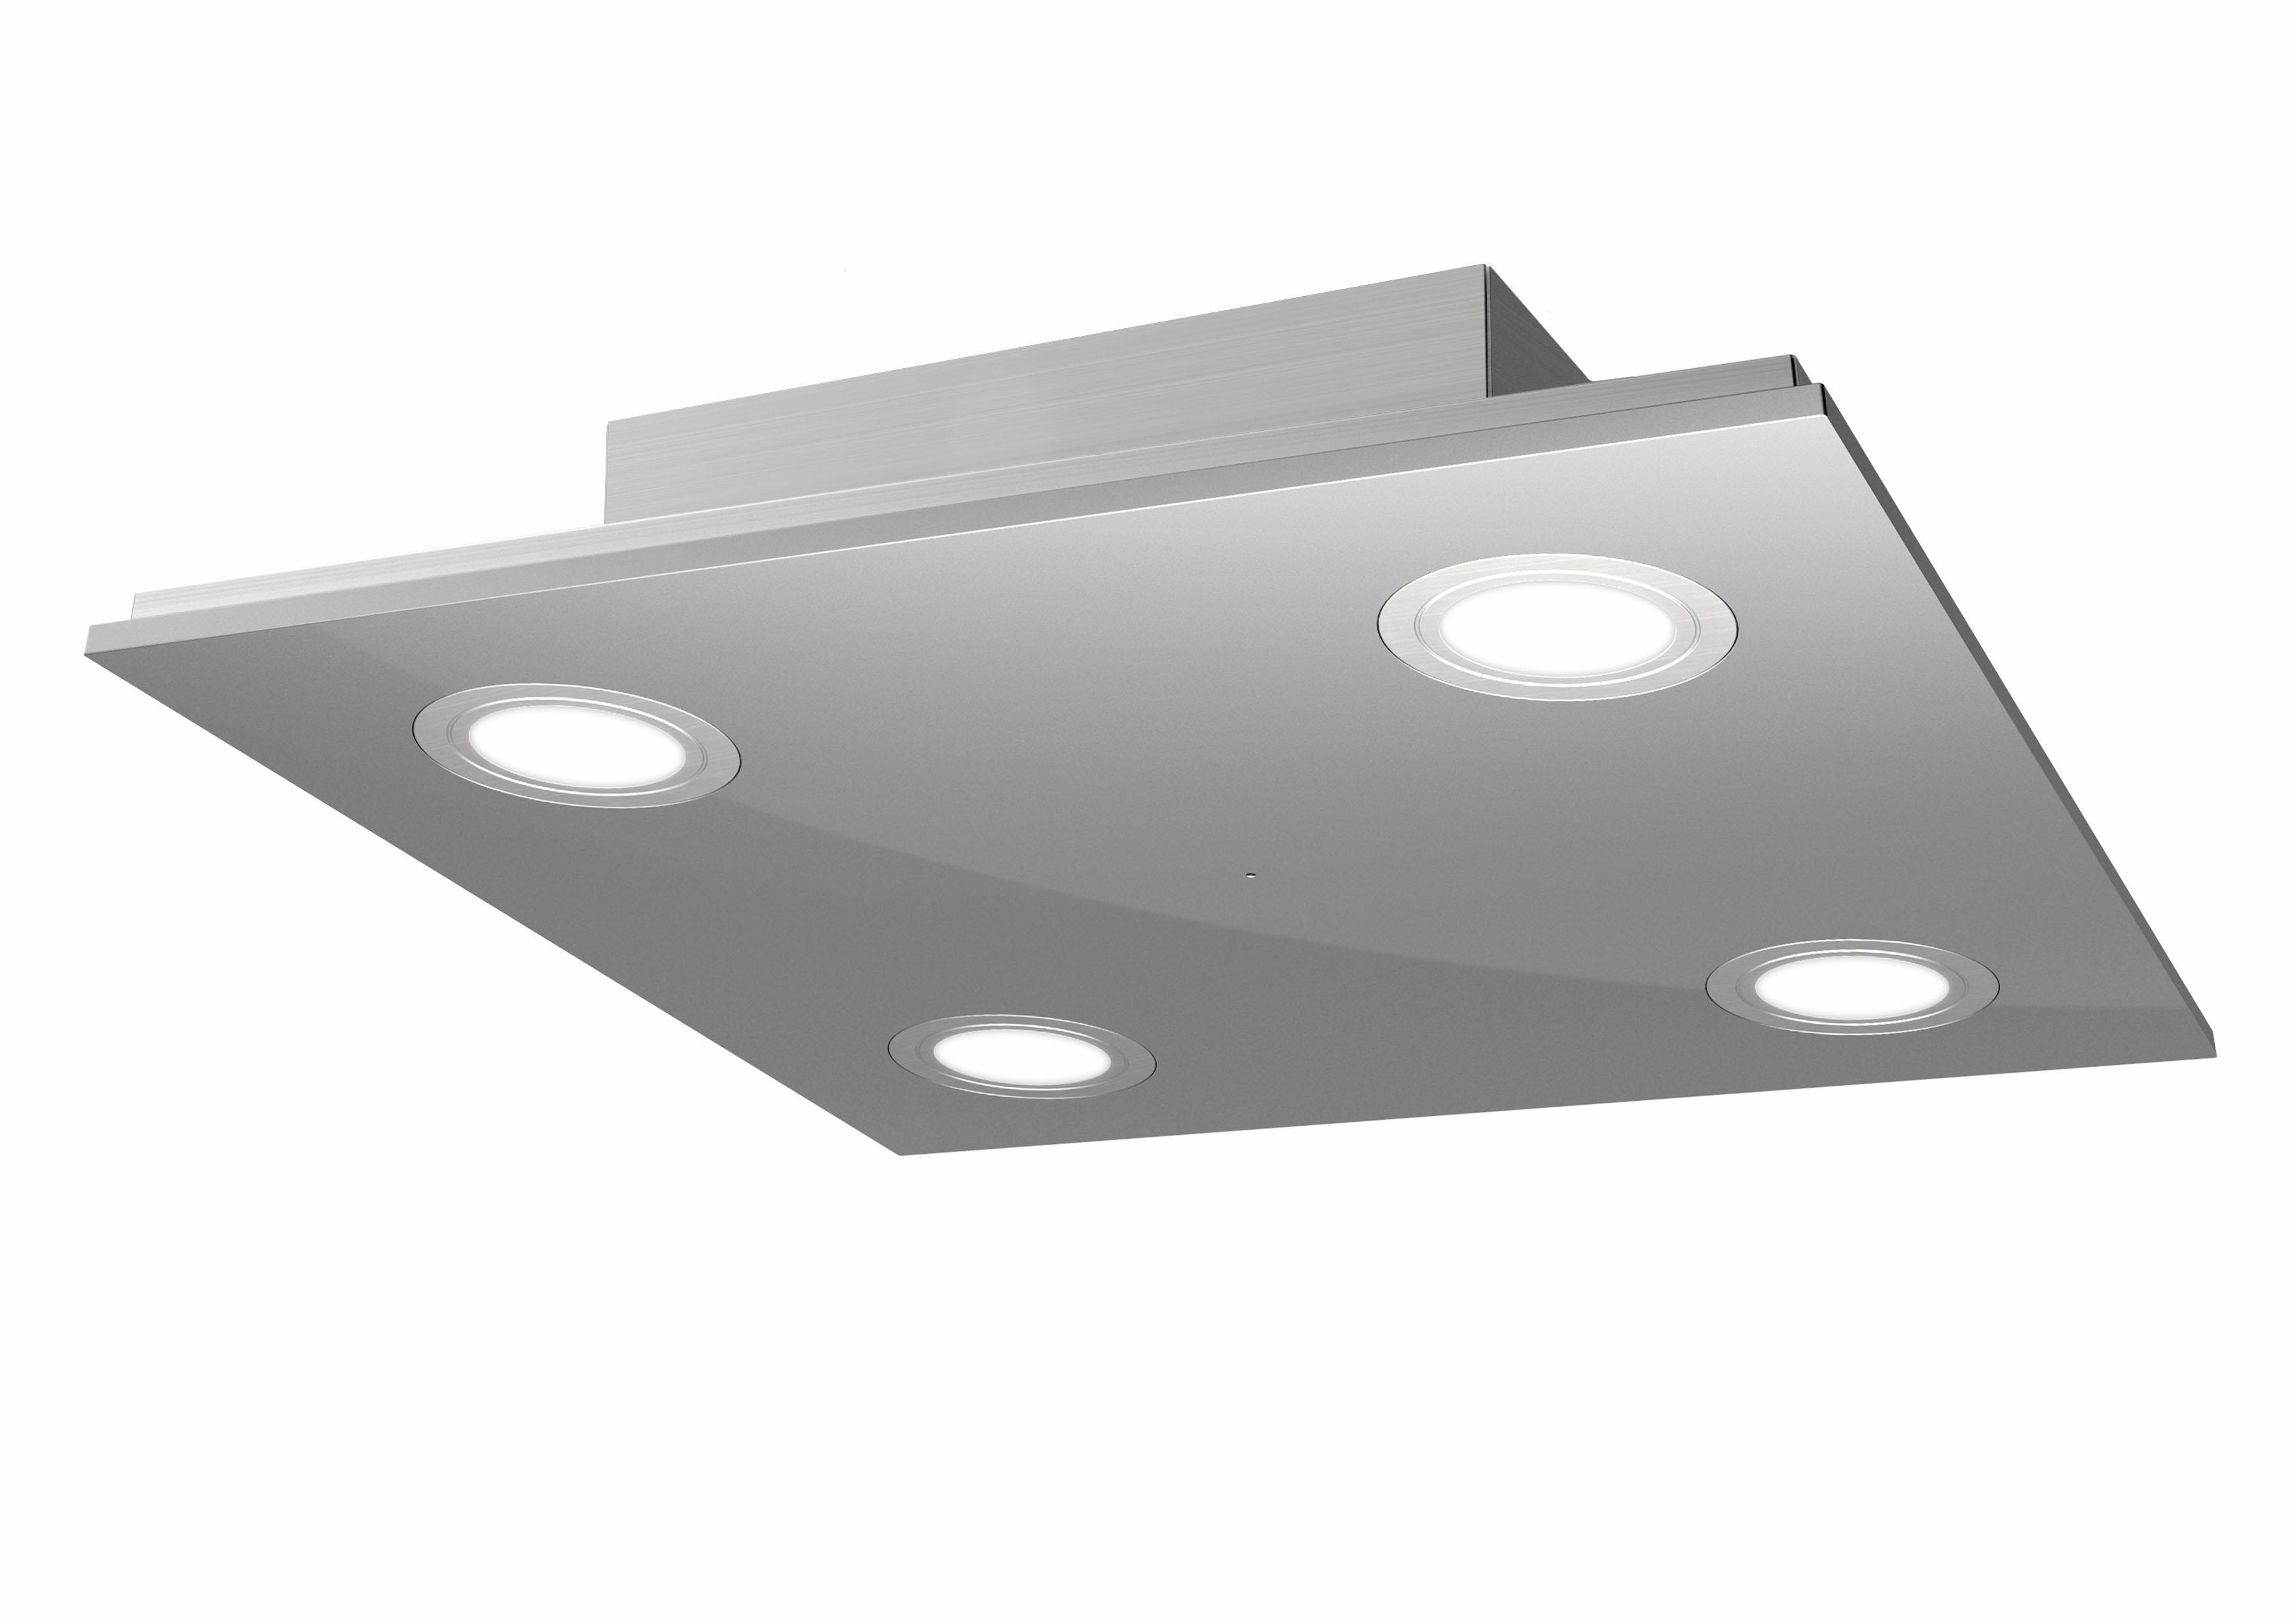 EVOTEC LED Deckenleuchte PANO, LED-Board, Warmweiß, LED Deckenlampe